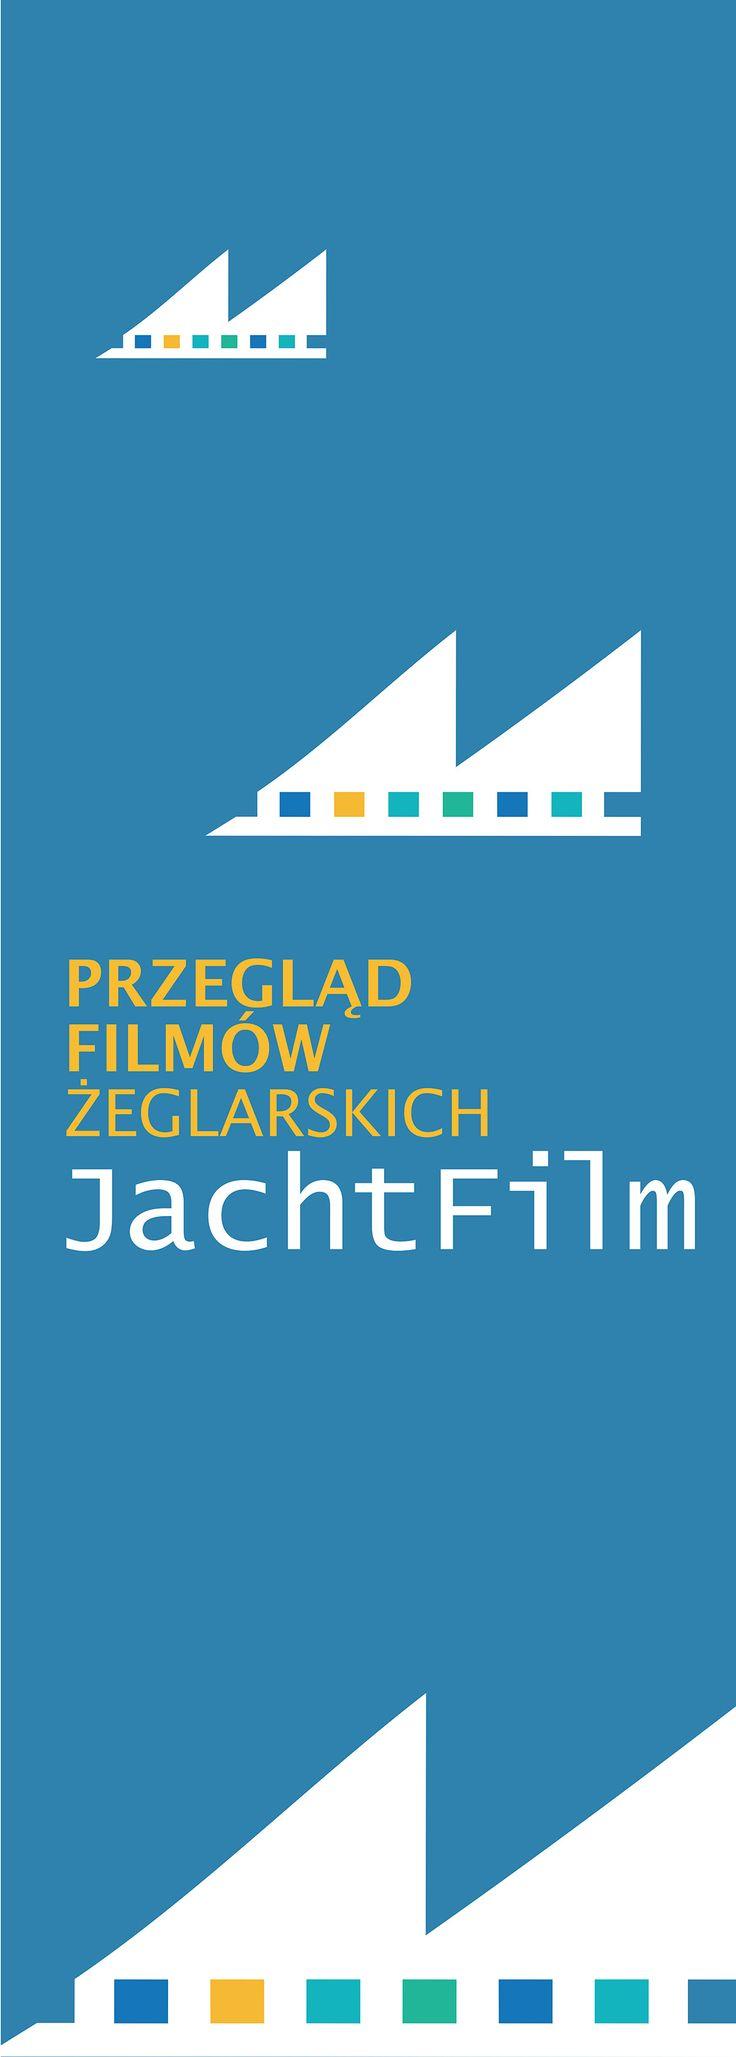 JachtFilm Festiwal 2013 / roll up